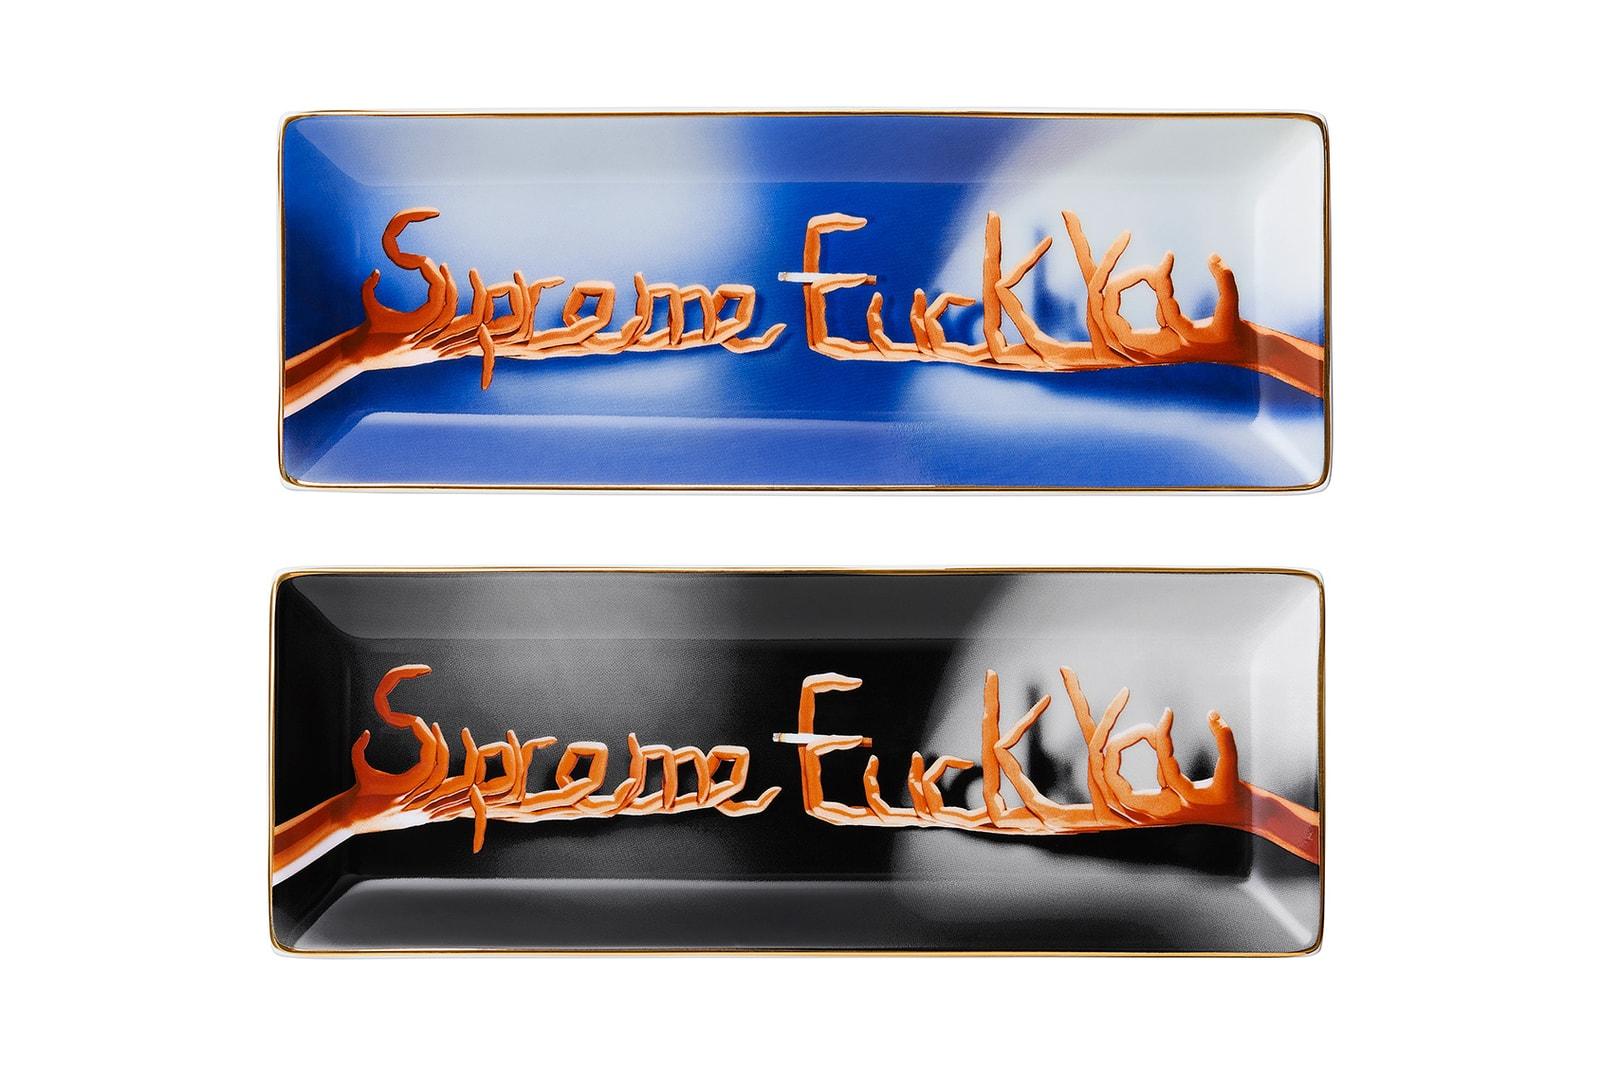 Supreme Palace advisory board crystals Mastermind Bape Pleasures Balenciaga fragment design the conveni madonna photo tee box logo taped seam jacket